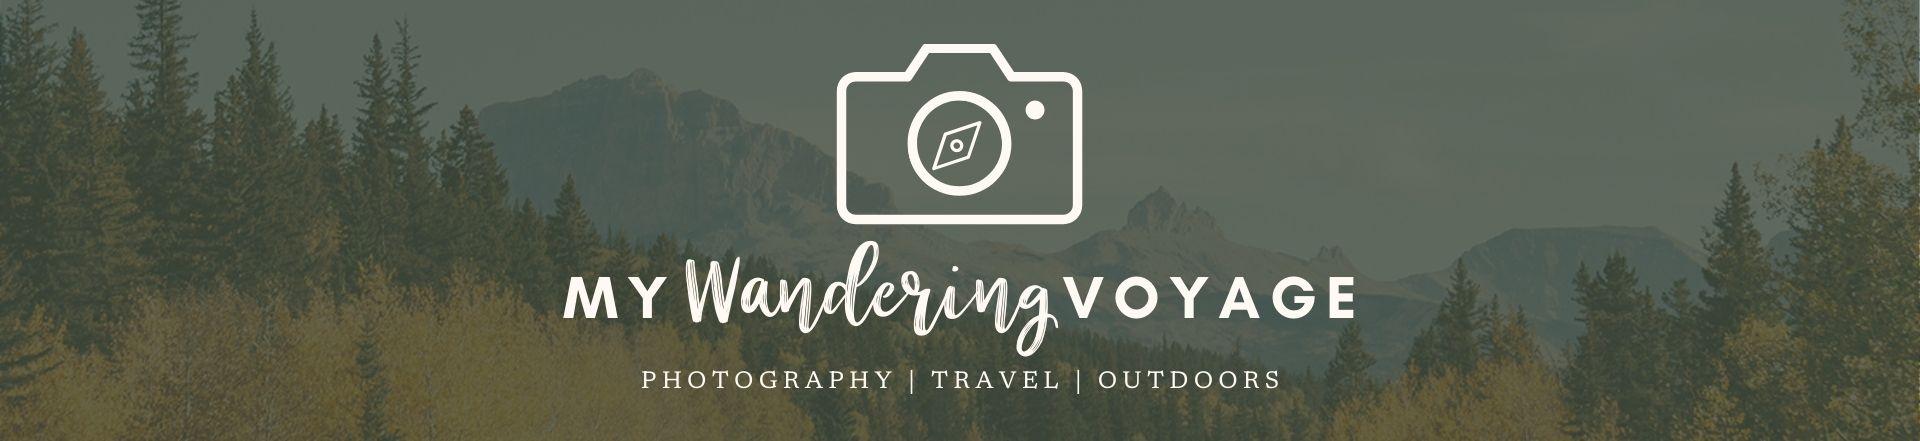 My Wandering Voyage